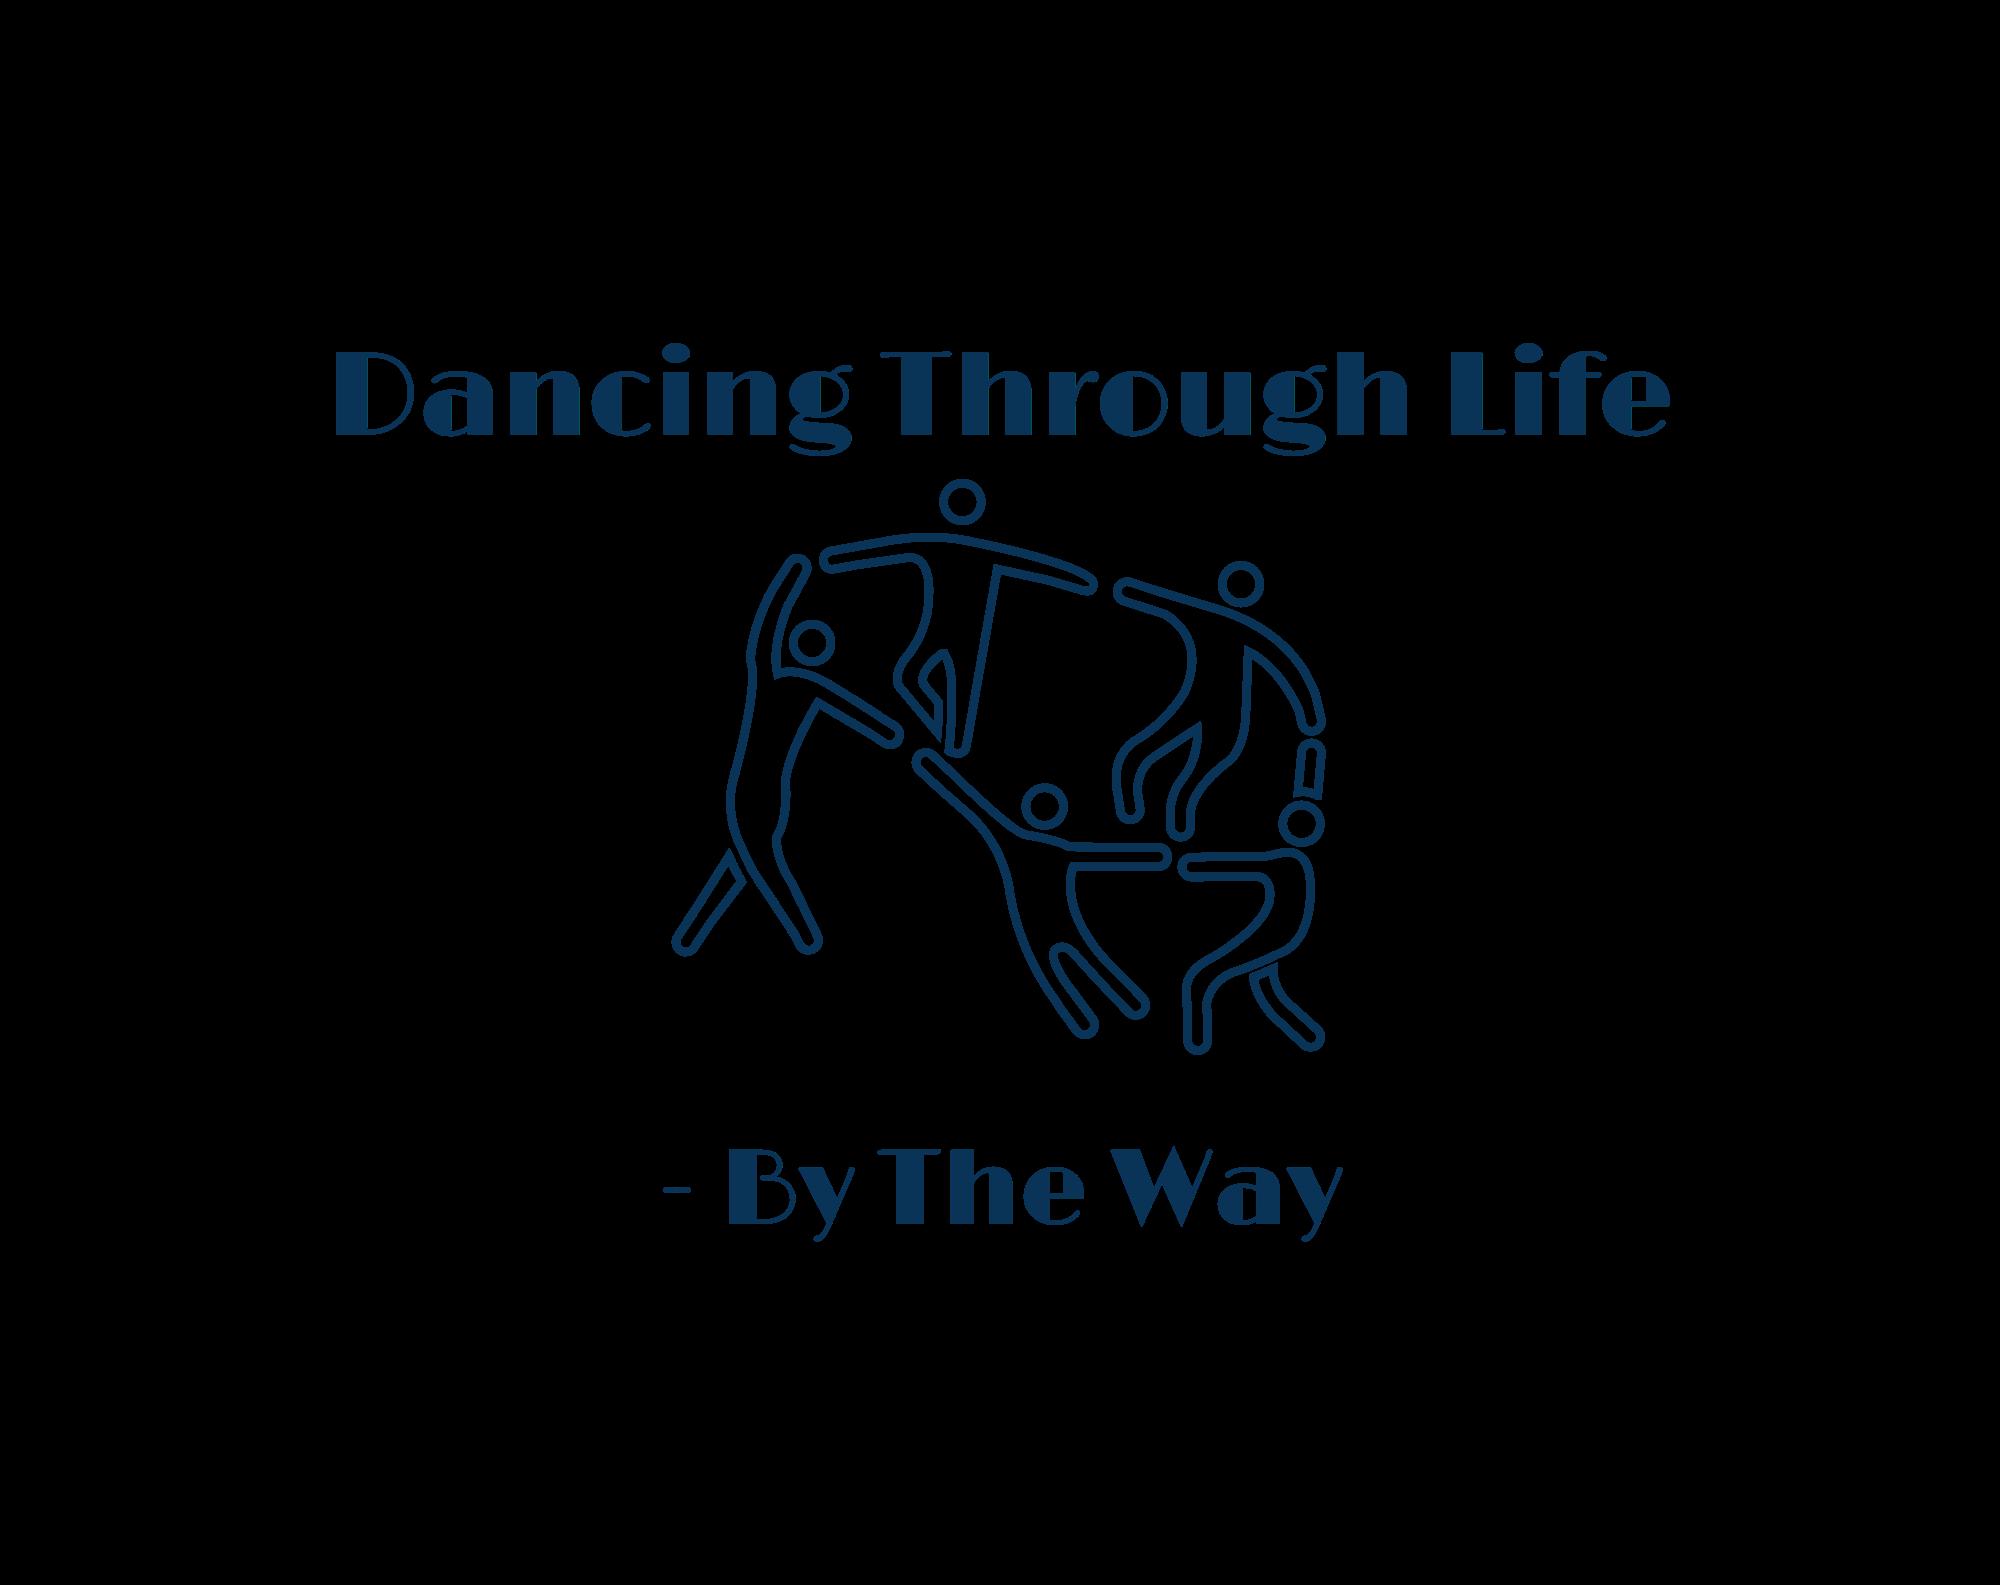 Dancing Through Life-logo.png